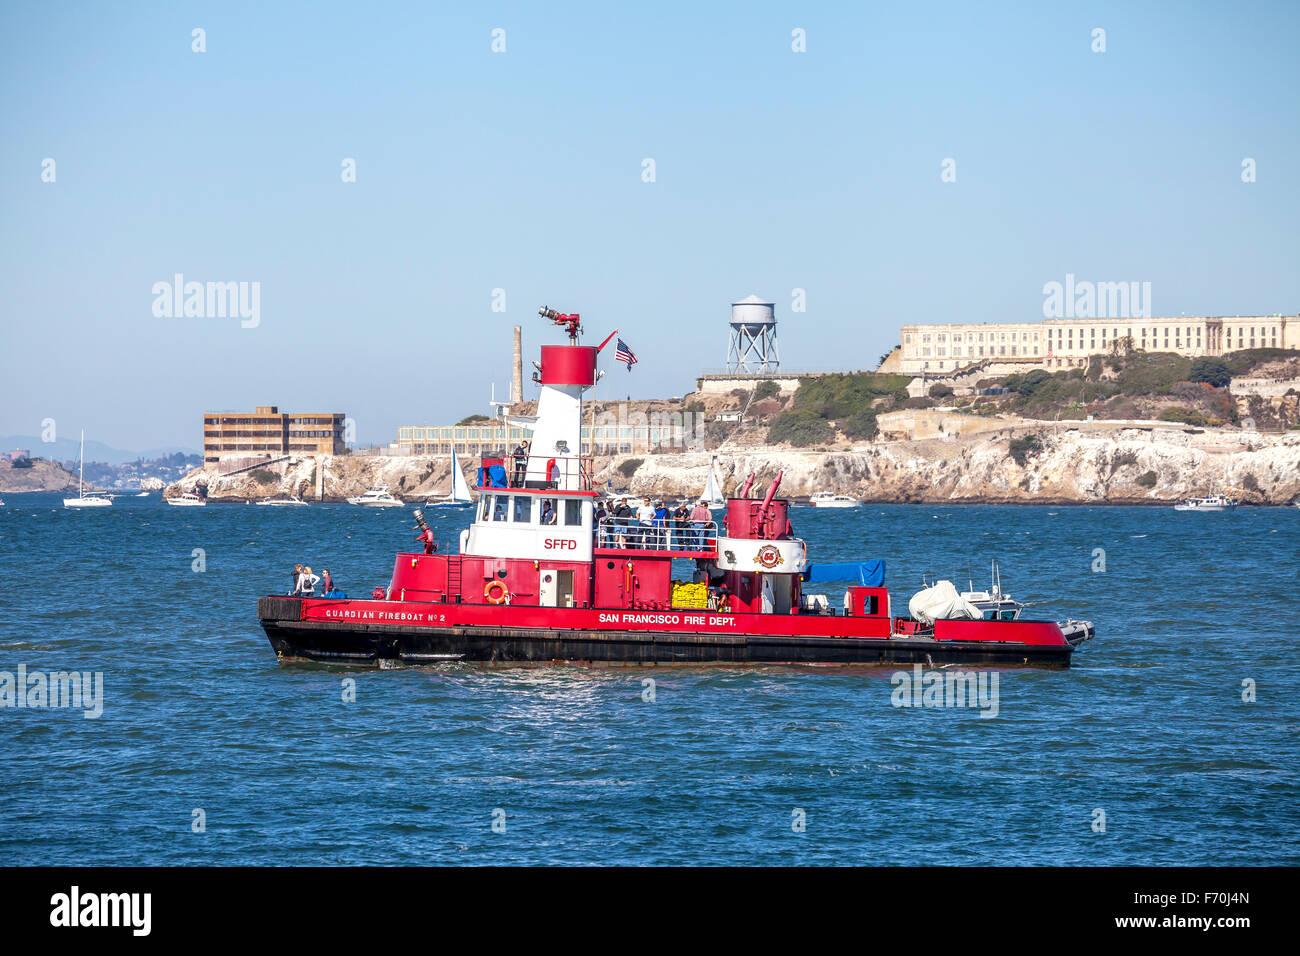 San Francisco Fire Department rescue boat patrolling the San Francisco Bay during fleet week, San Francisco, California, - Stock Image